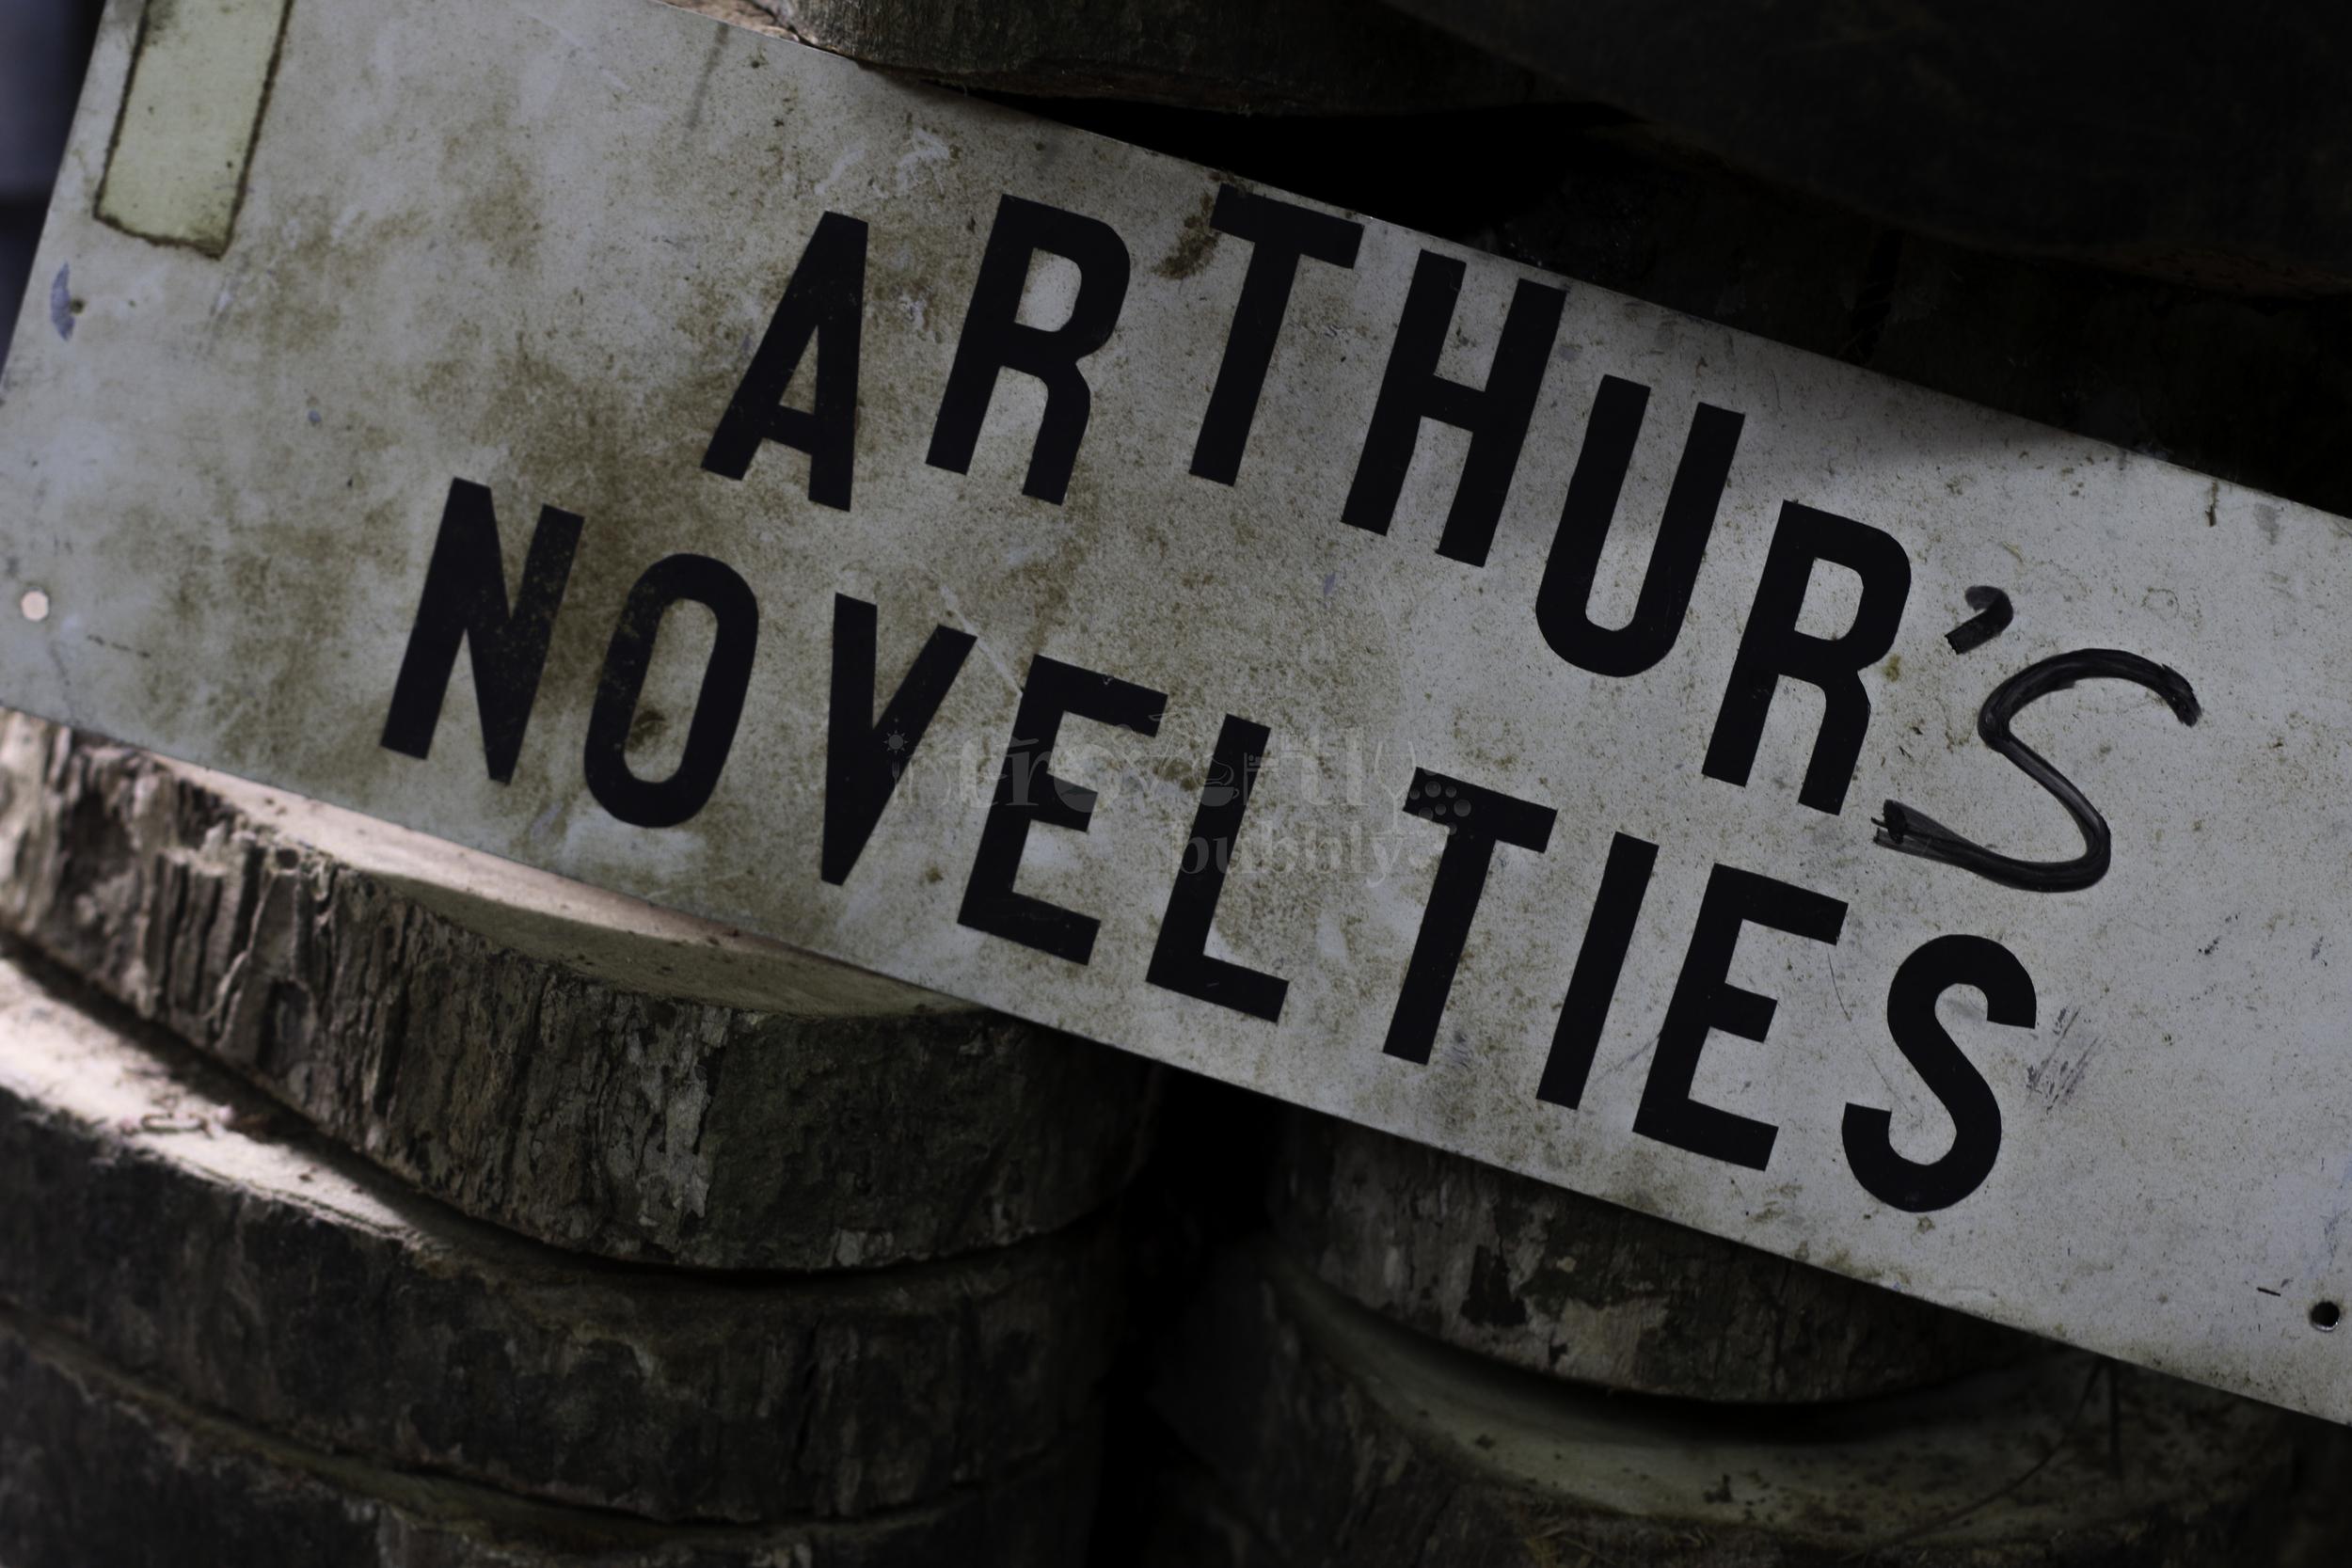 Artisan+Series++At+Home+with+Arthur-72.jpg